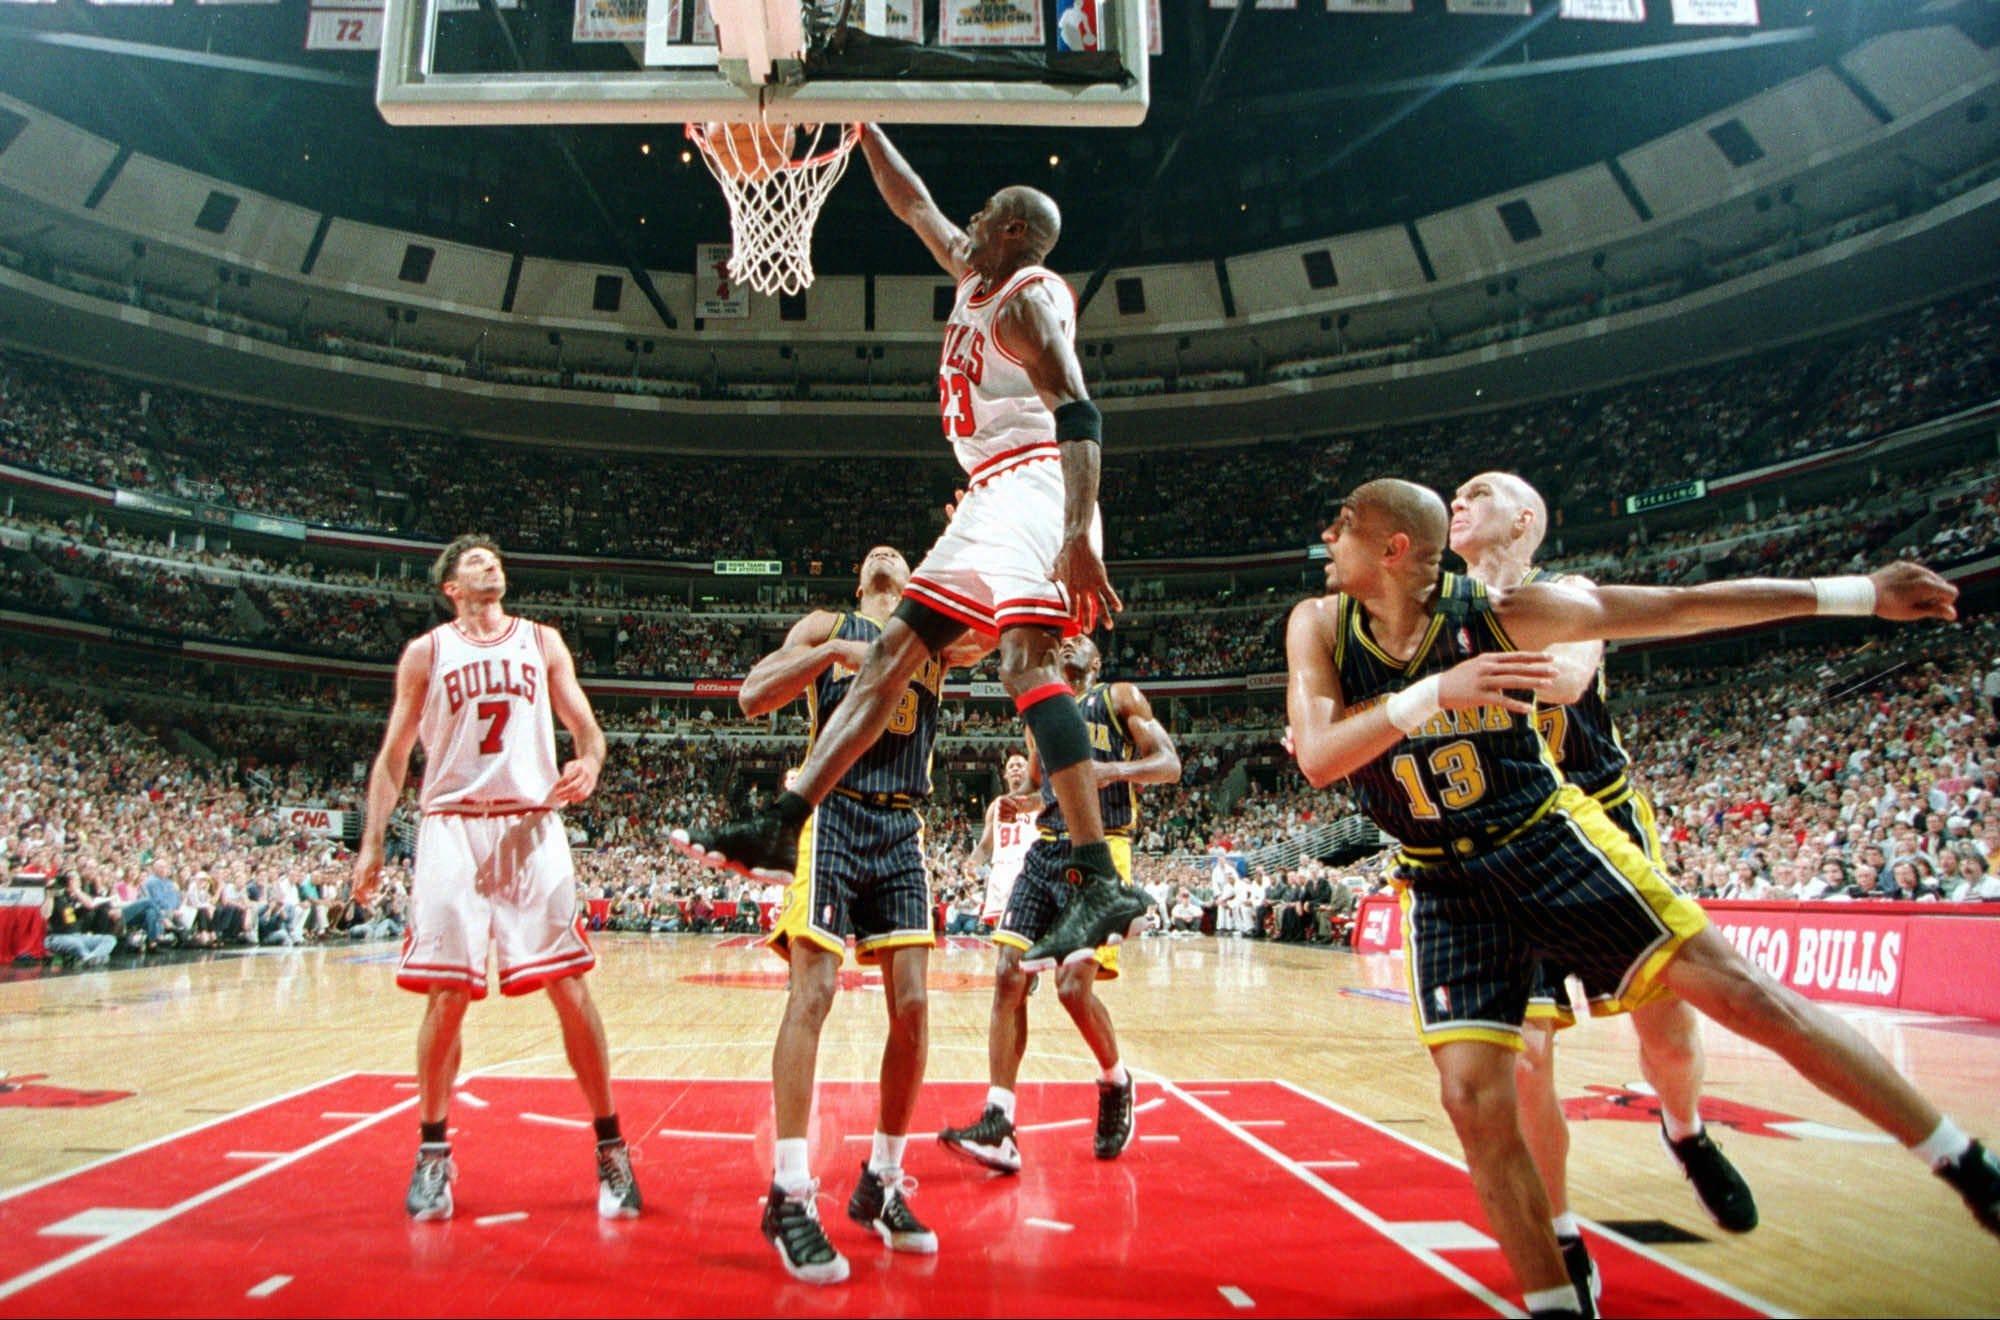 Looking back at 1998 Bulls vs. Pacers